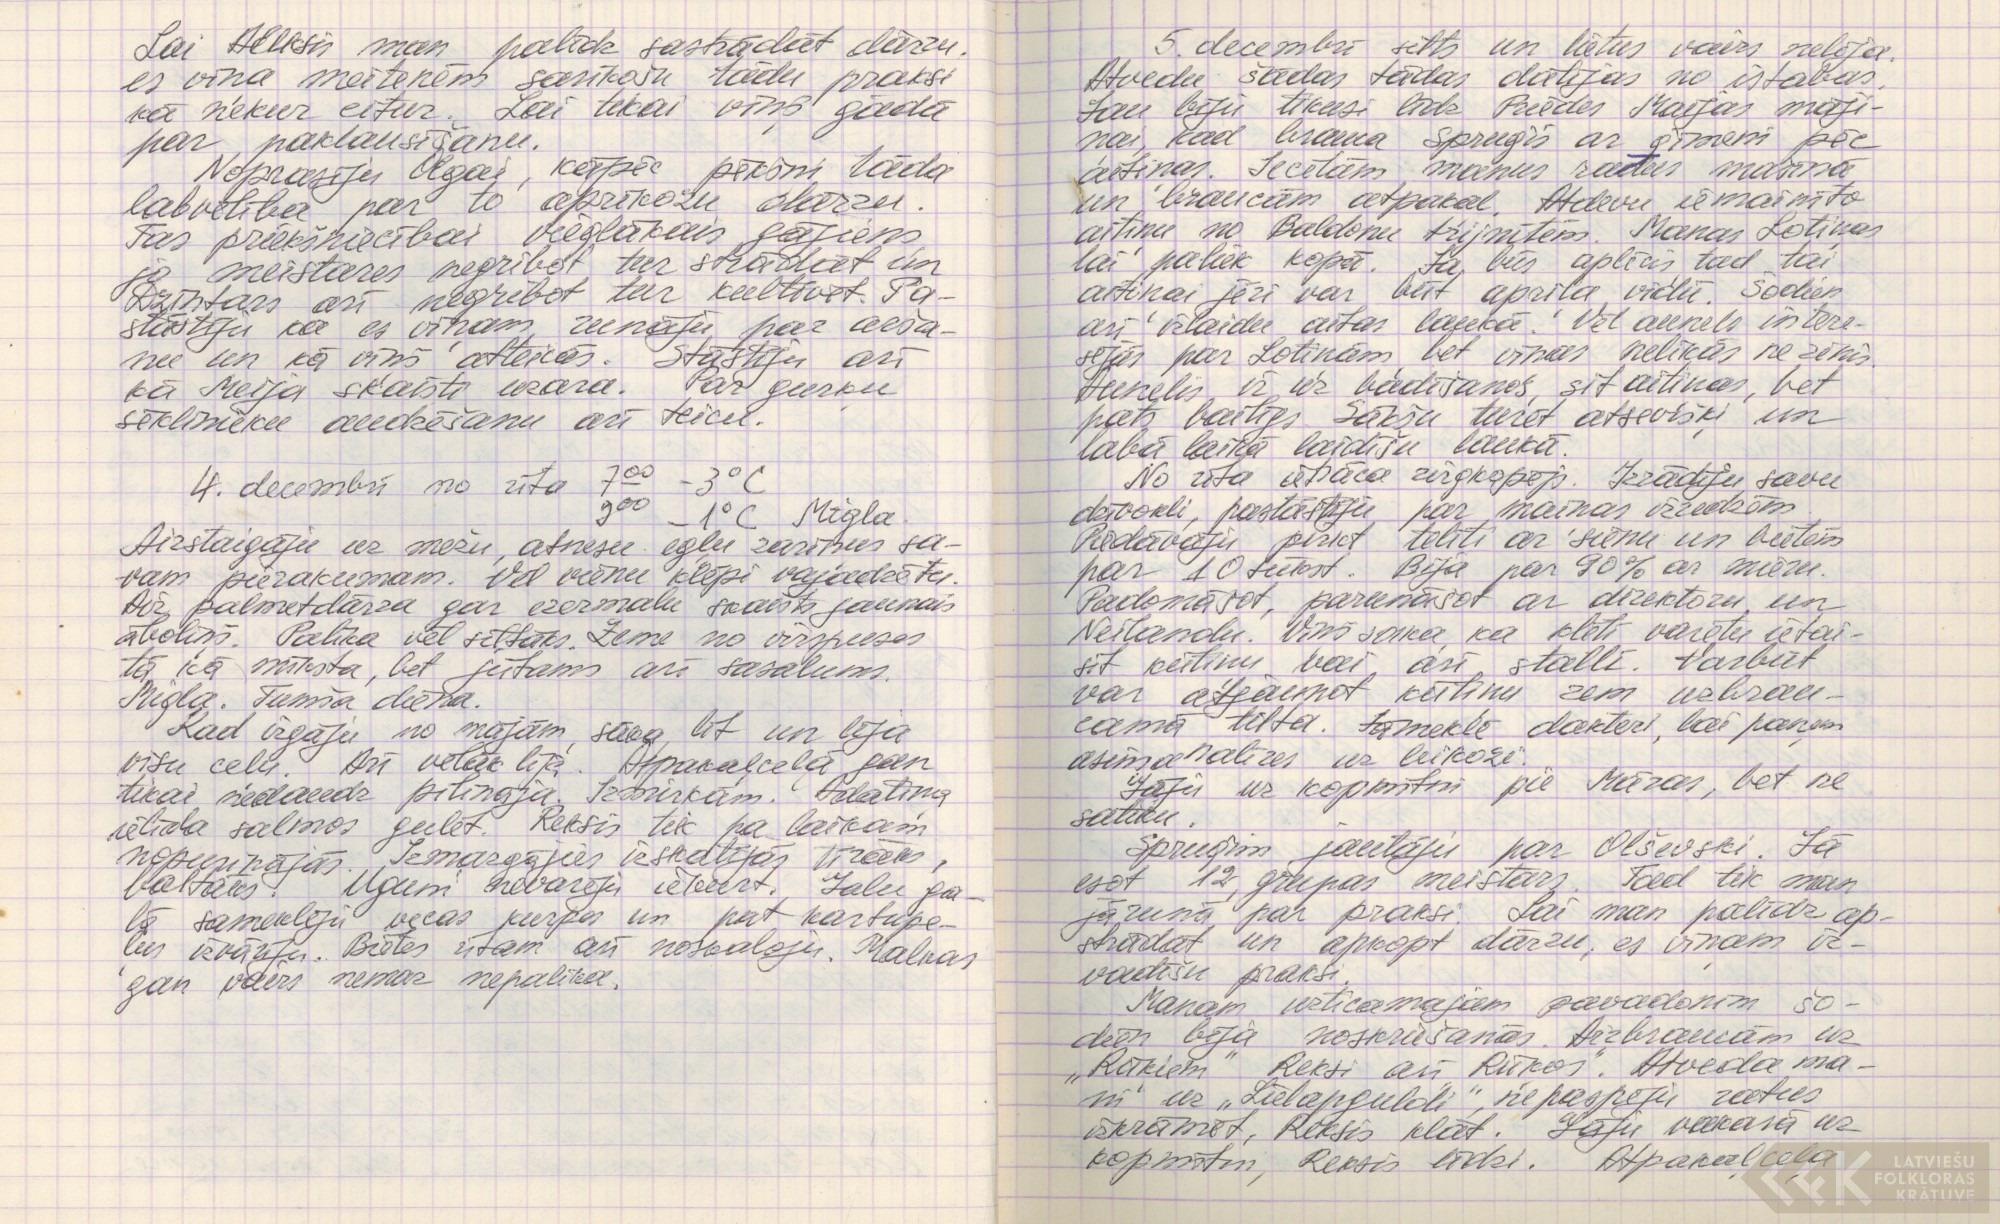 Ak161-Ligitas-Vucenas-dienasgramatas-29-0044